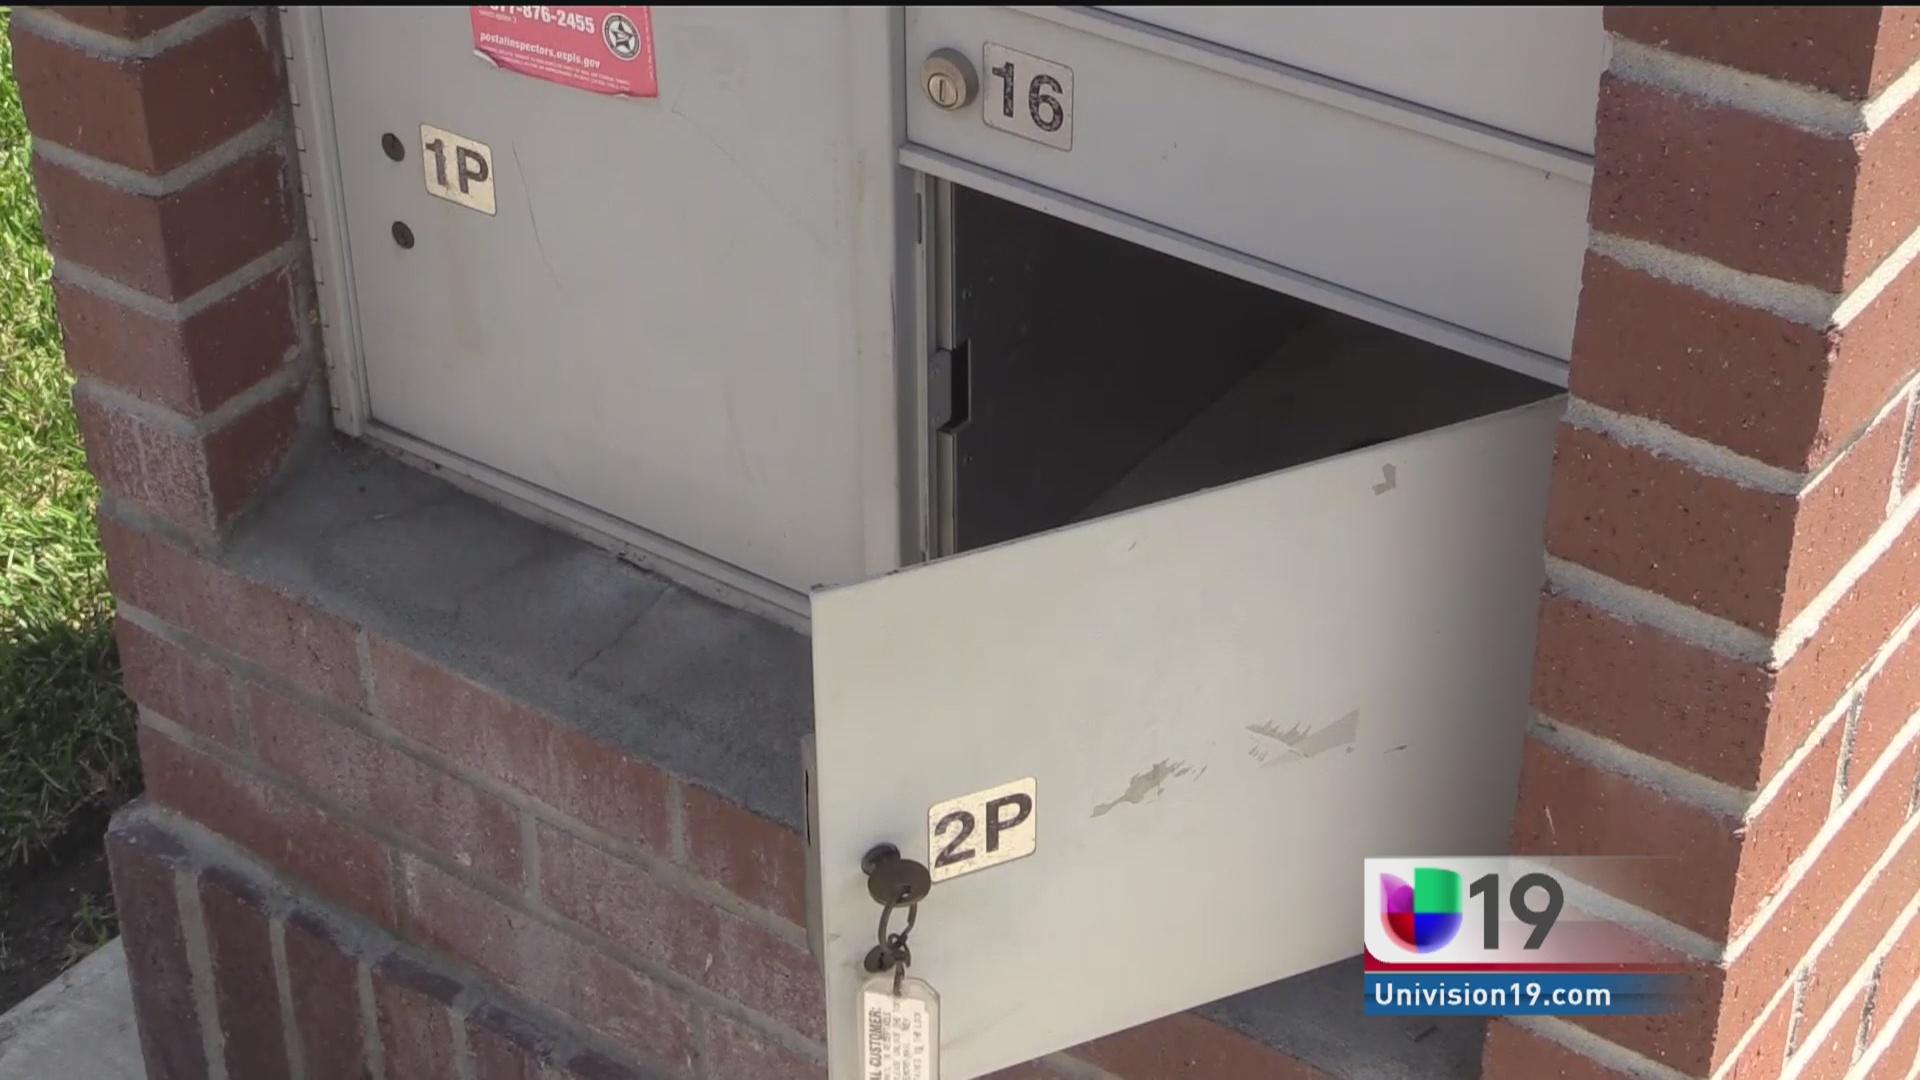 Aumentan robos de correspondencia en Stockton